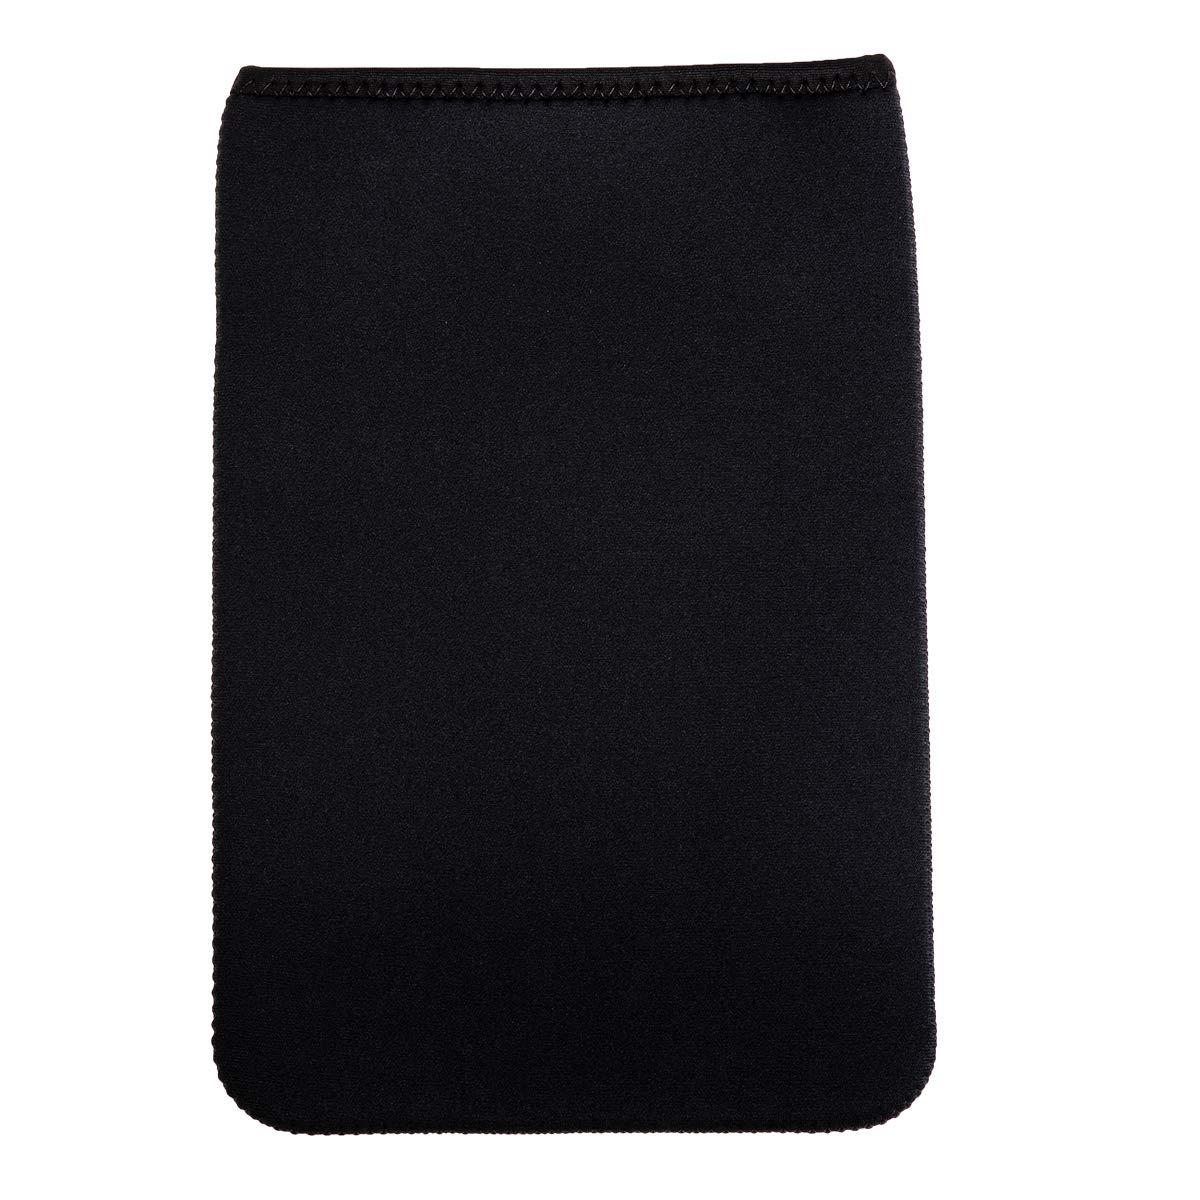 OP/TECH USA 4601751 Smart Sleeve 751, Neoprene Sleeve for Kindle DX (7 5 x  11 2), Black